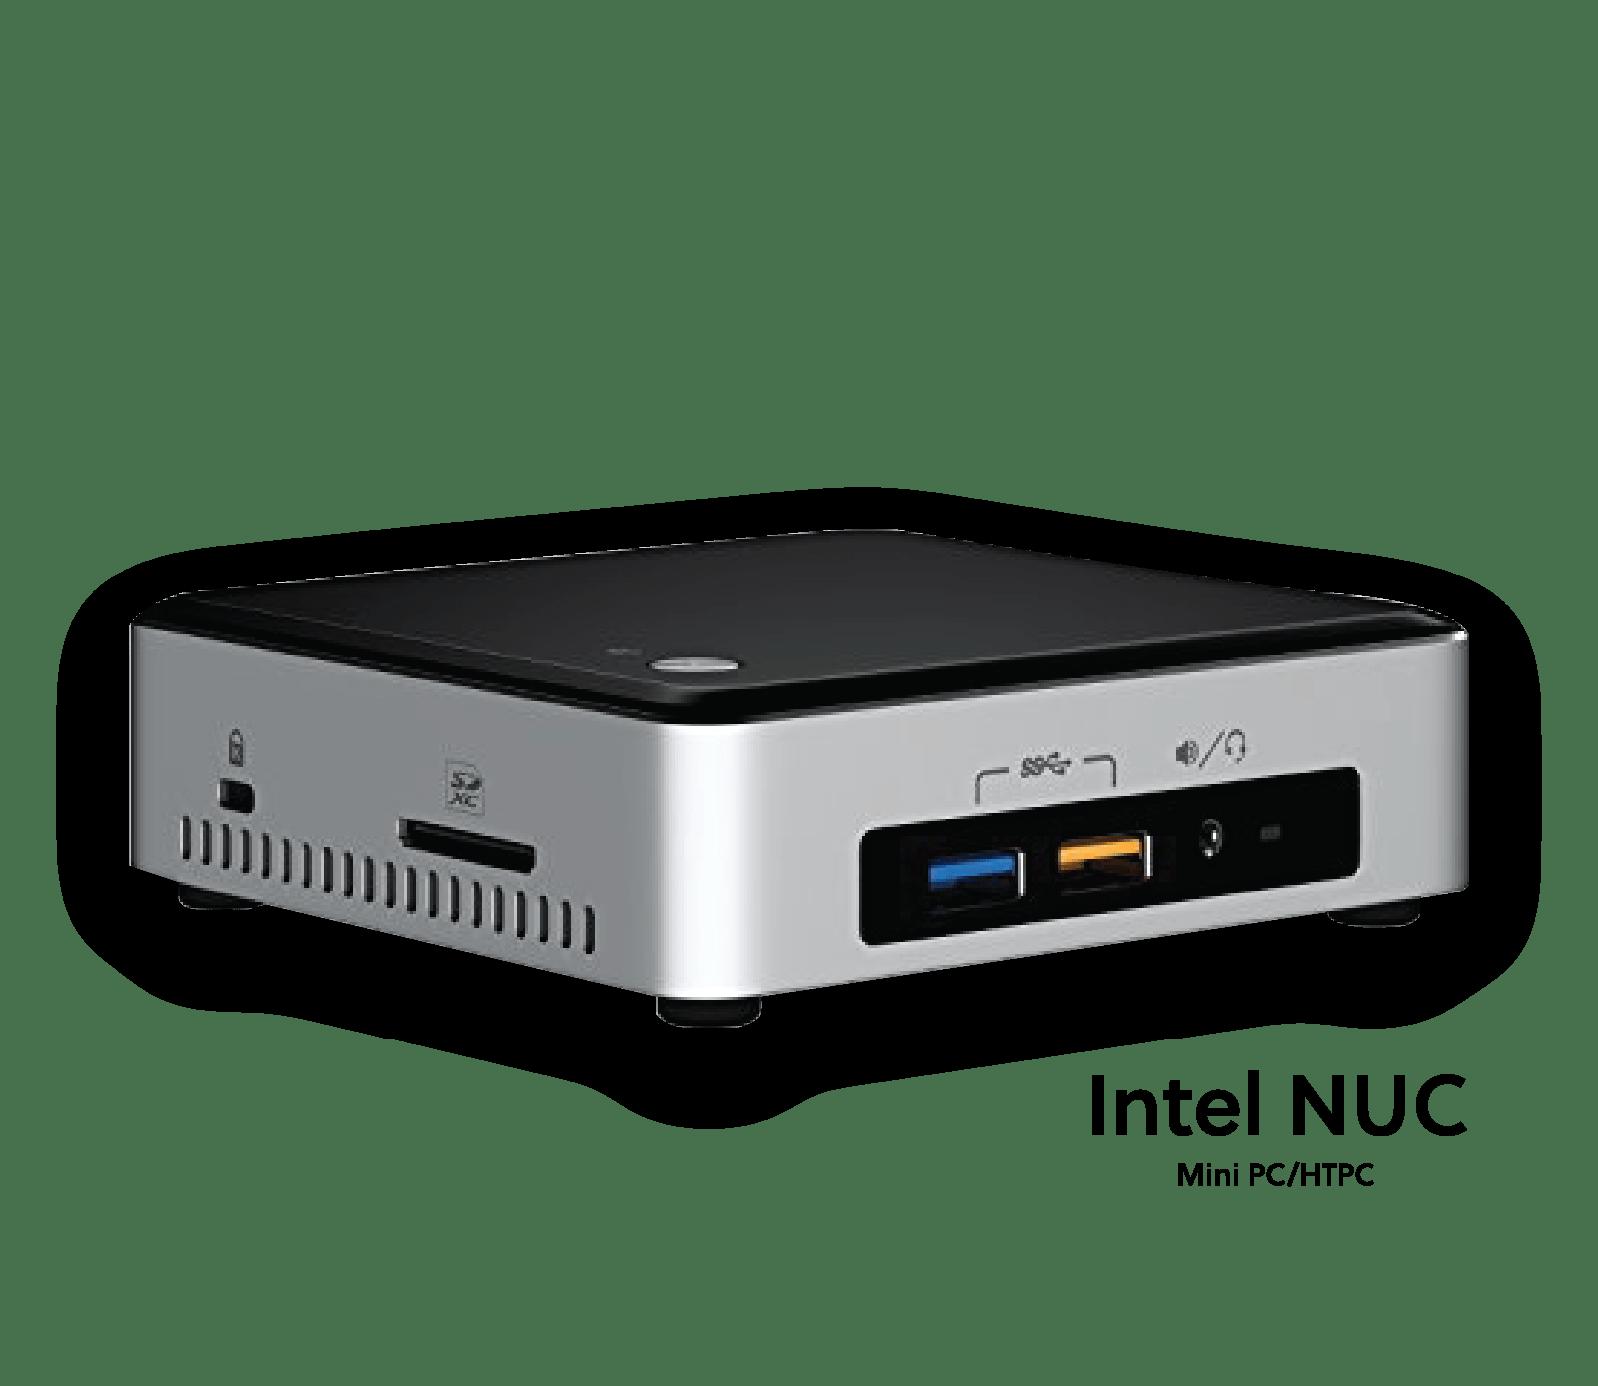 Intel Nuc 2